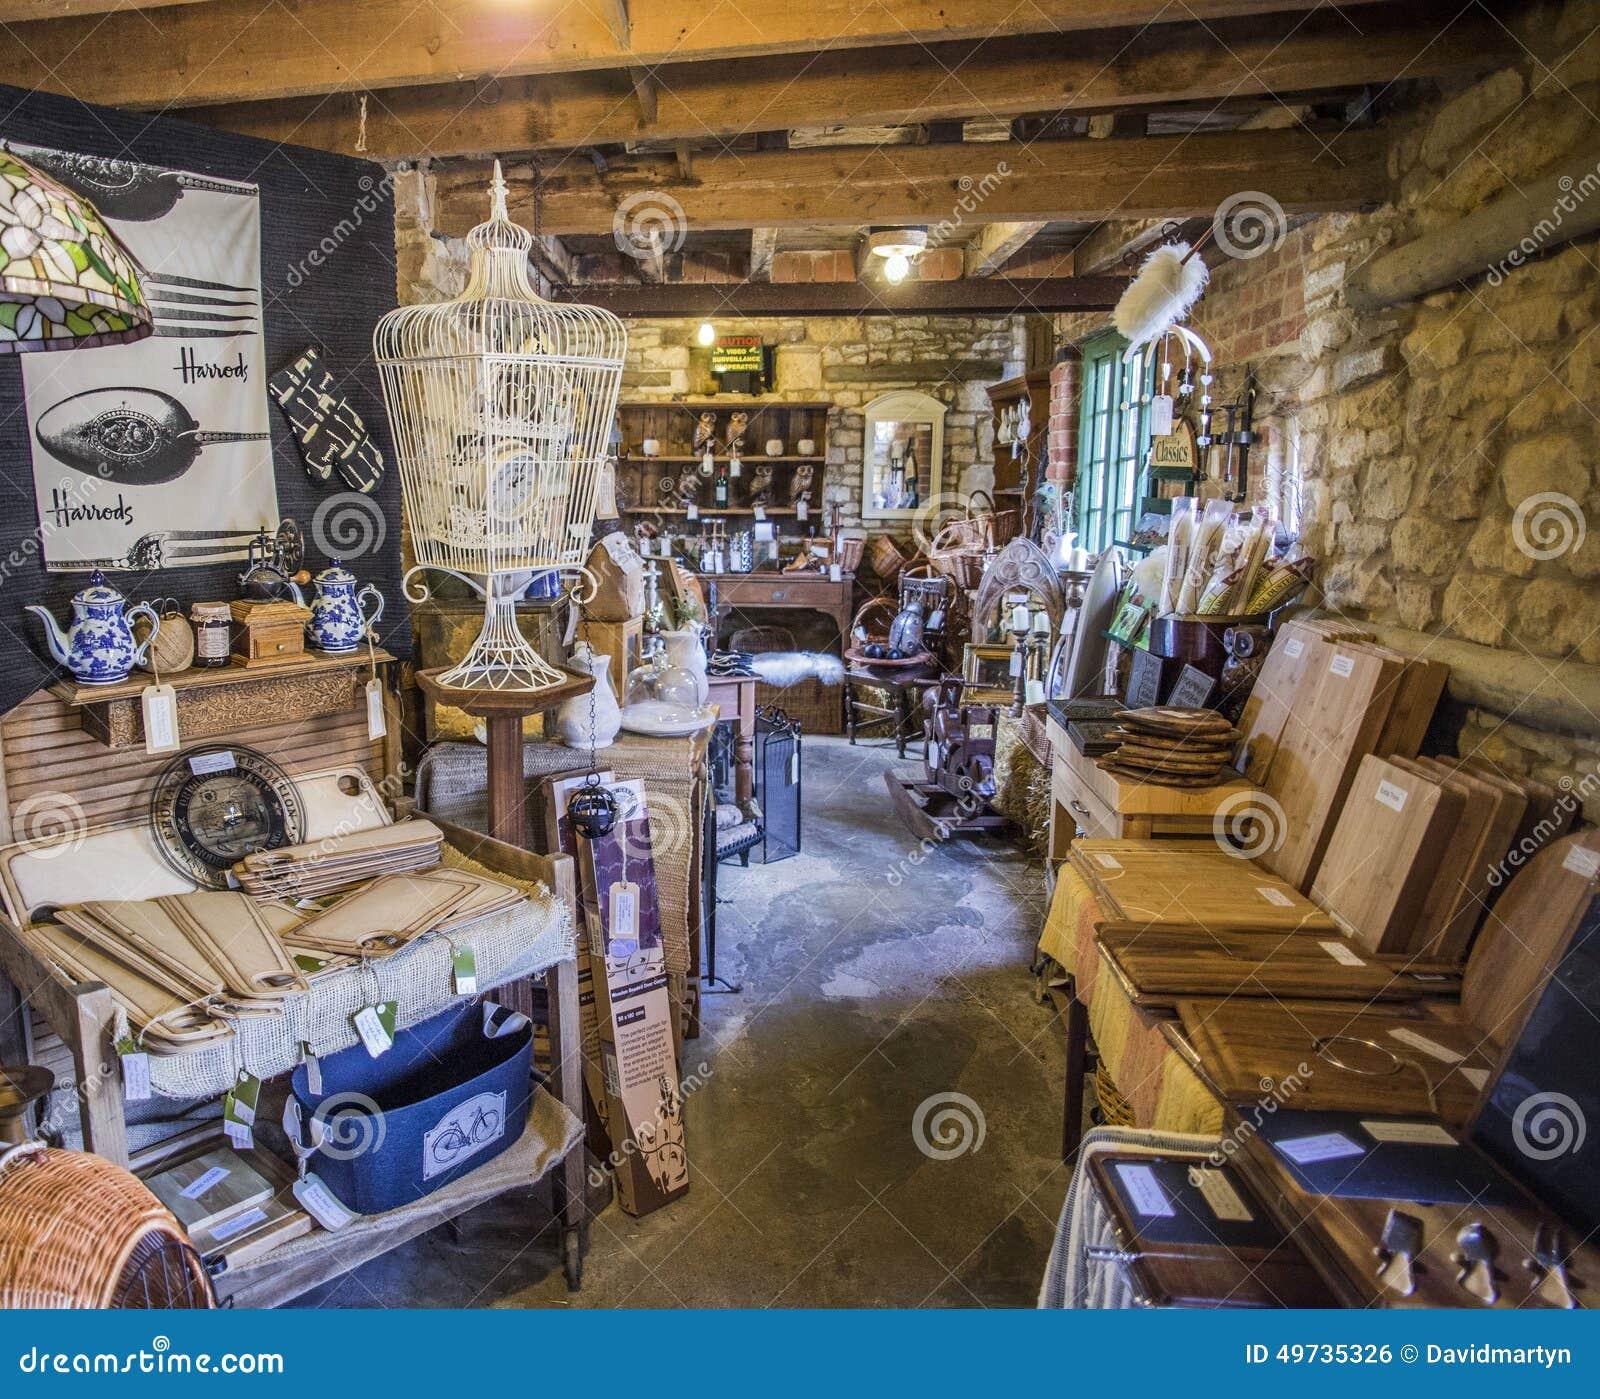 Junk Glorious Junk, The Finest Junk Shops In London | Alice Woods | furniture junk shop